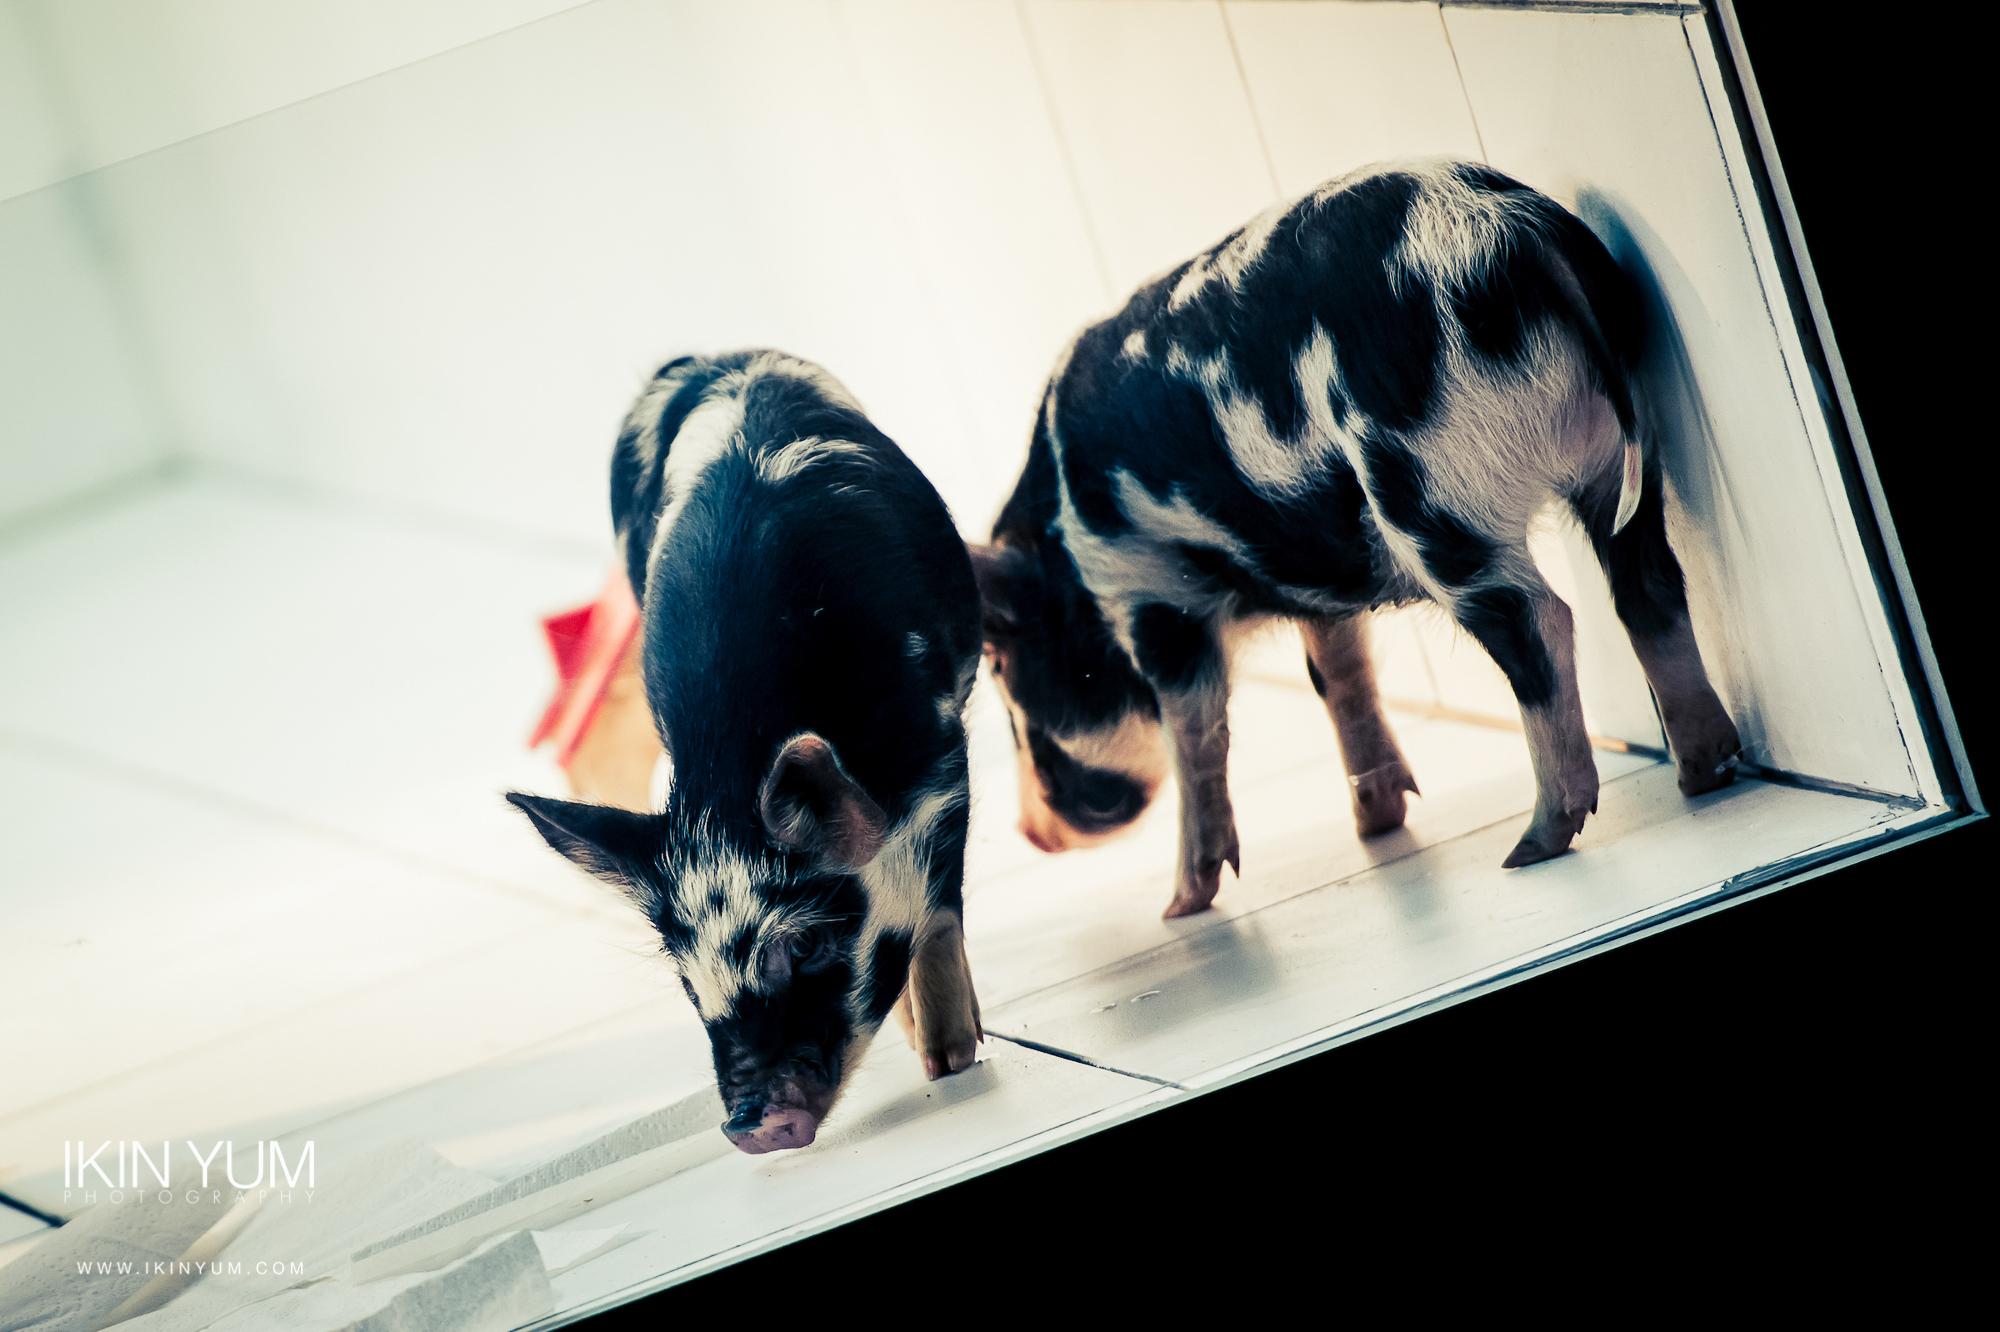 Goya - Gate theatre - Ikin Yum Photography-048.jpg